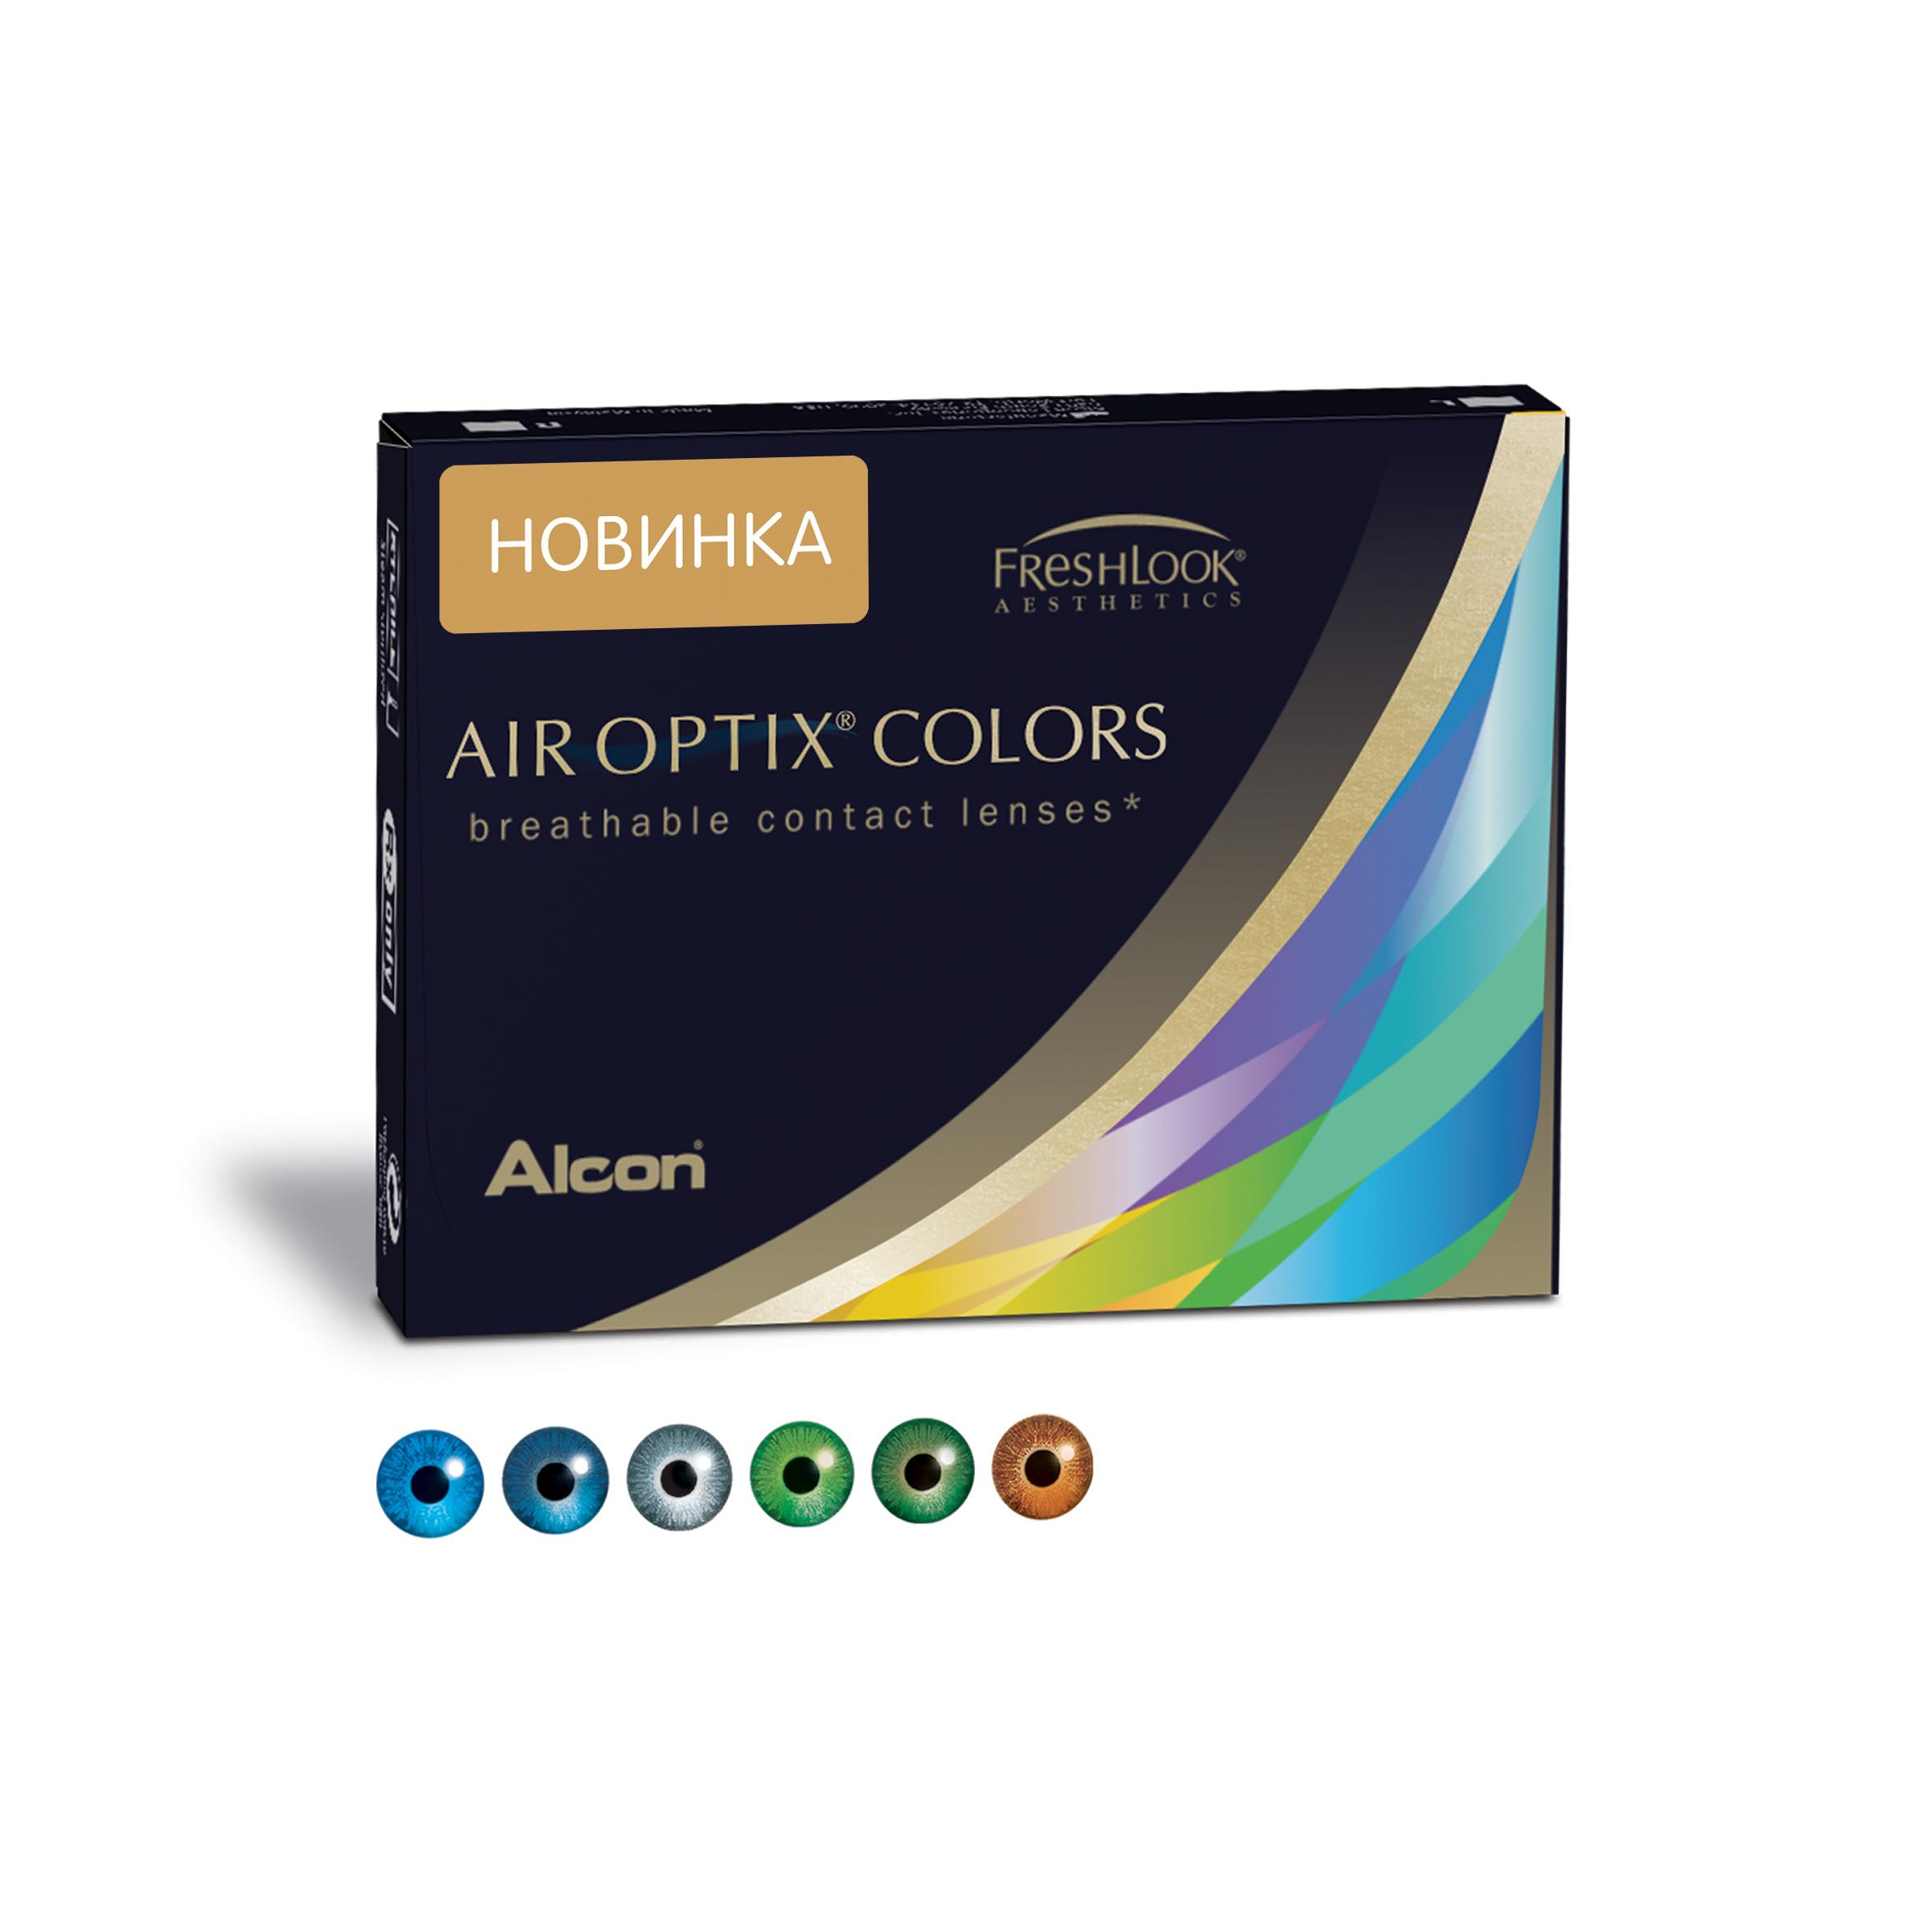 Аlcon контактные линзы Air Optix Colors 2 шт -5.50 Gemstone Green31746286Мягкие контактные линзы